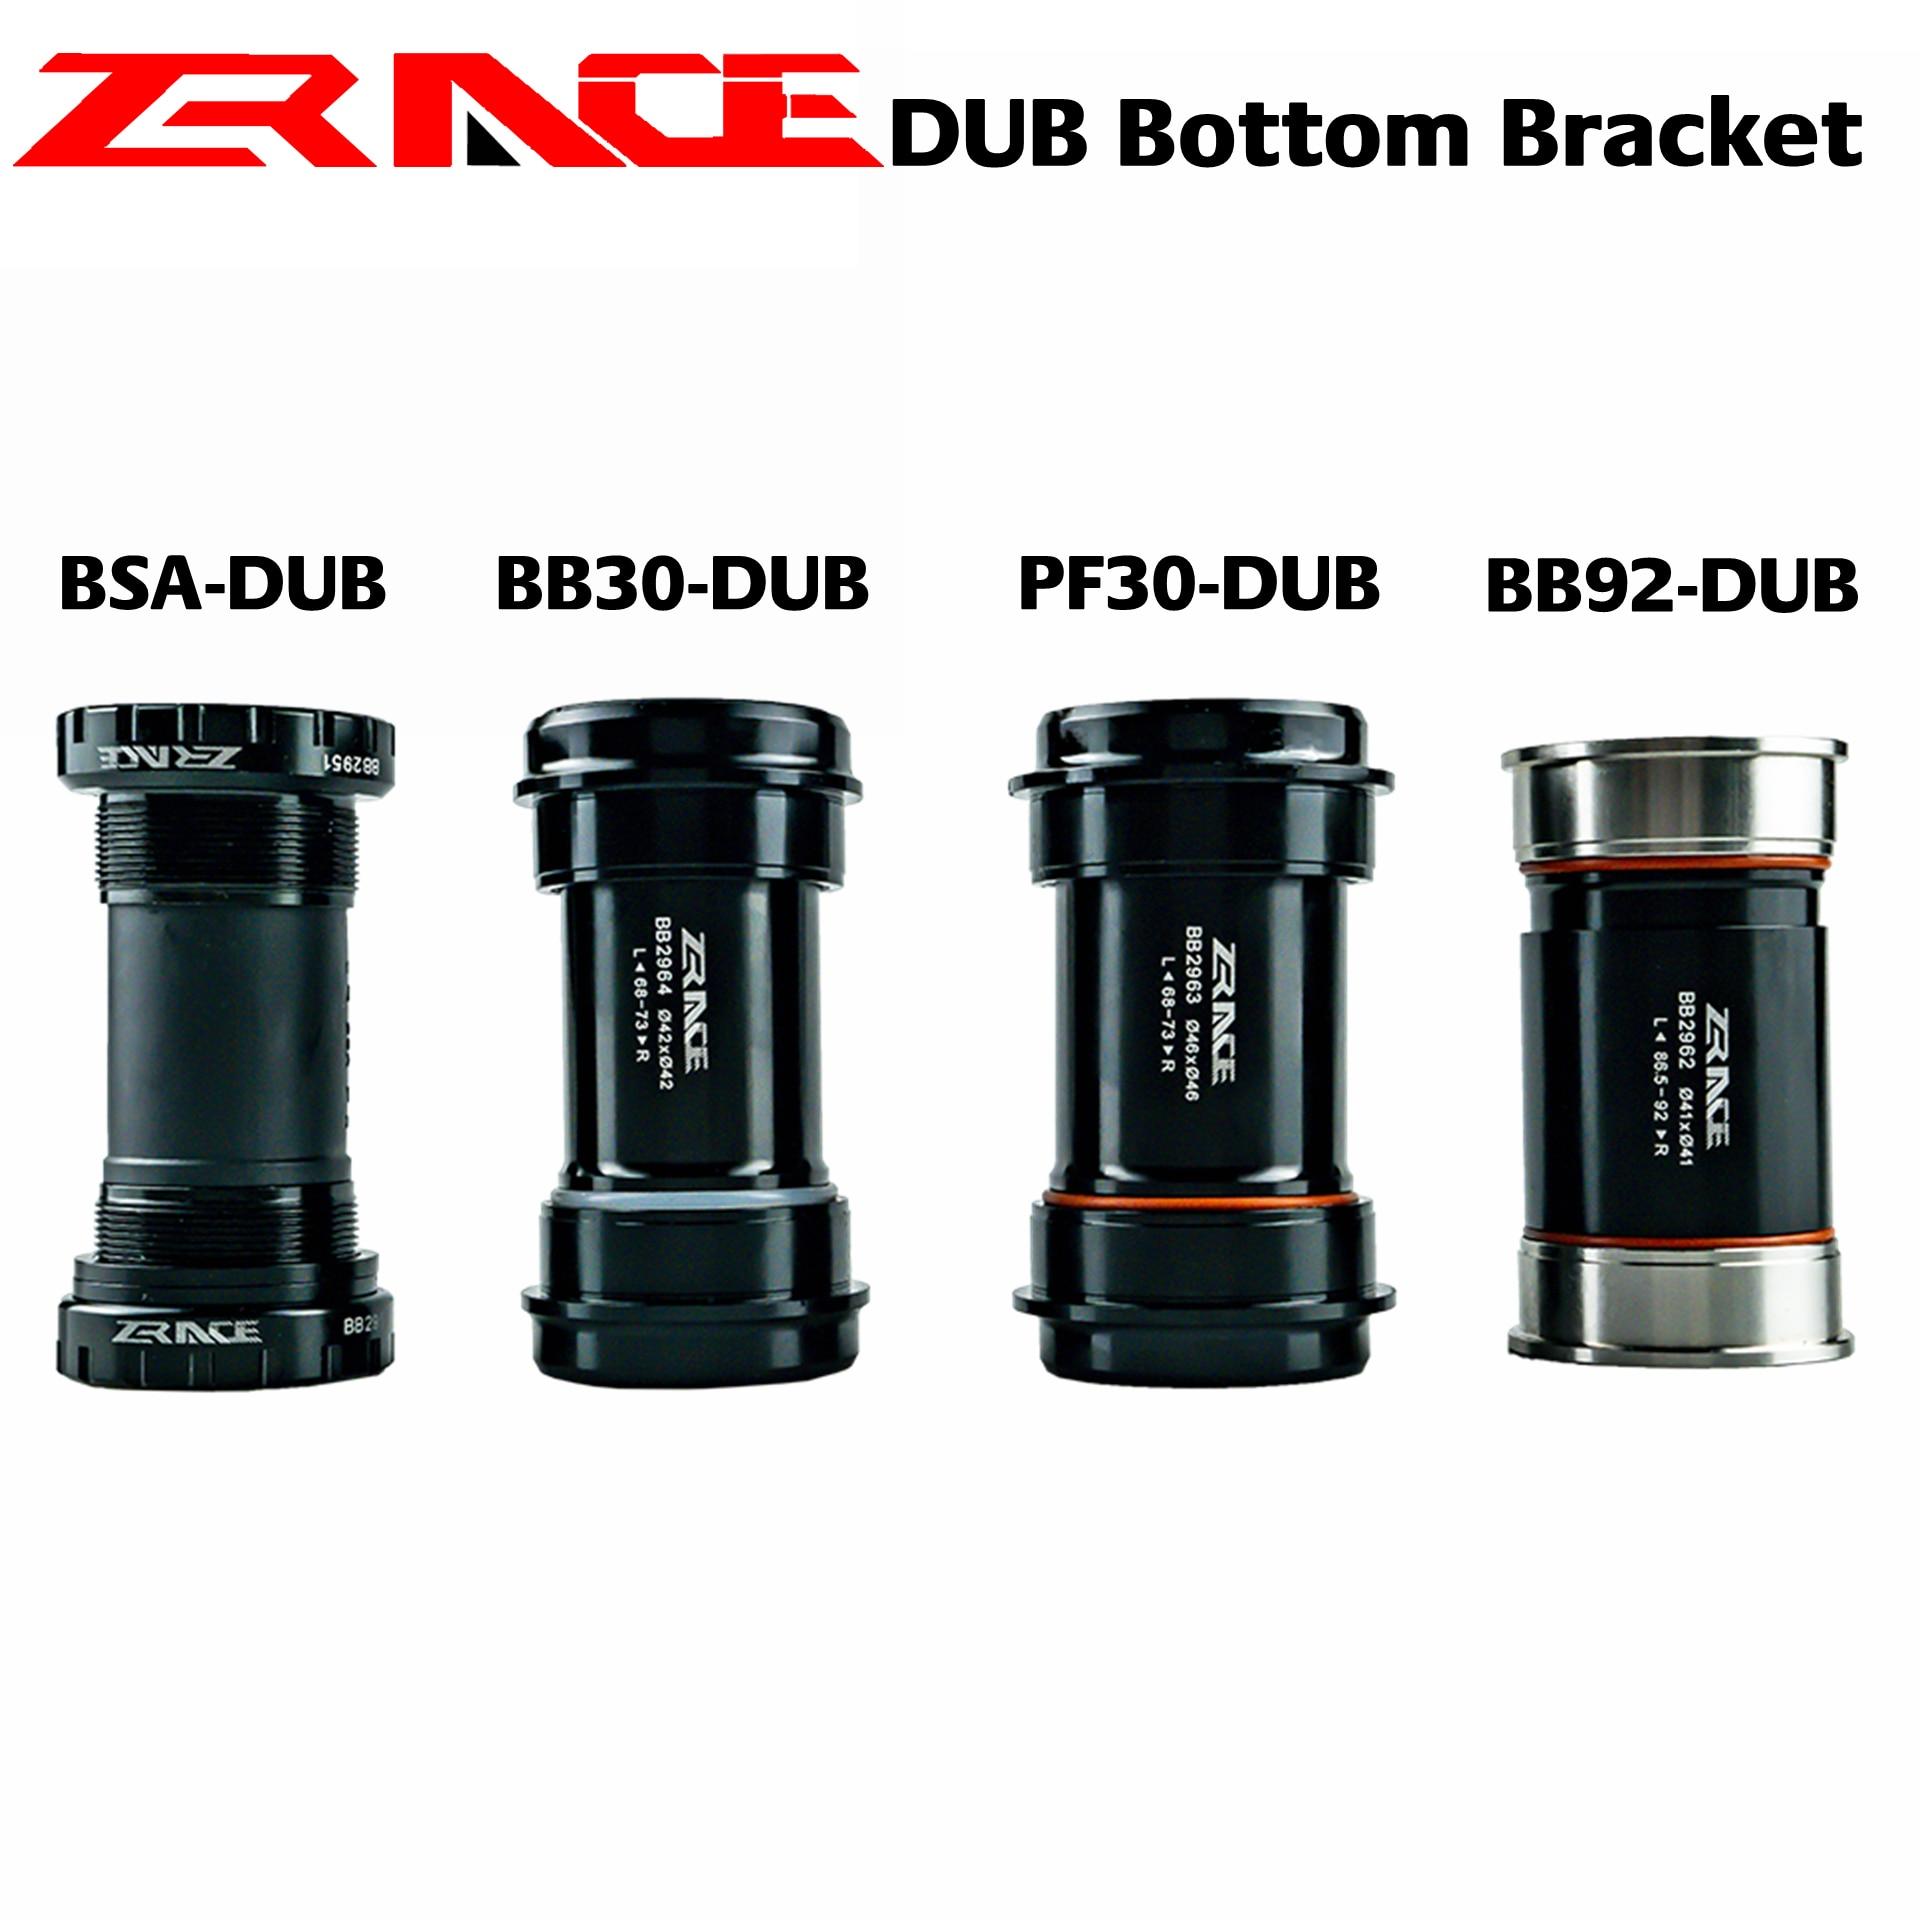 ZRACE DUB alt parantez, SRAM MTB/yol krank, DUB BSA, BB92, PF30, BB30 ile uyumlu geleneksel araçları BB29 yeni